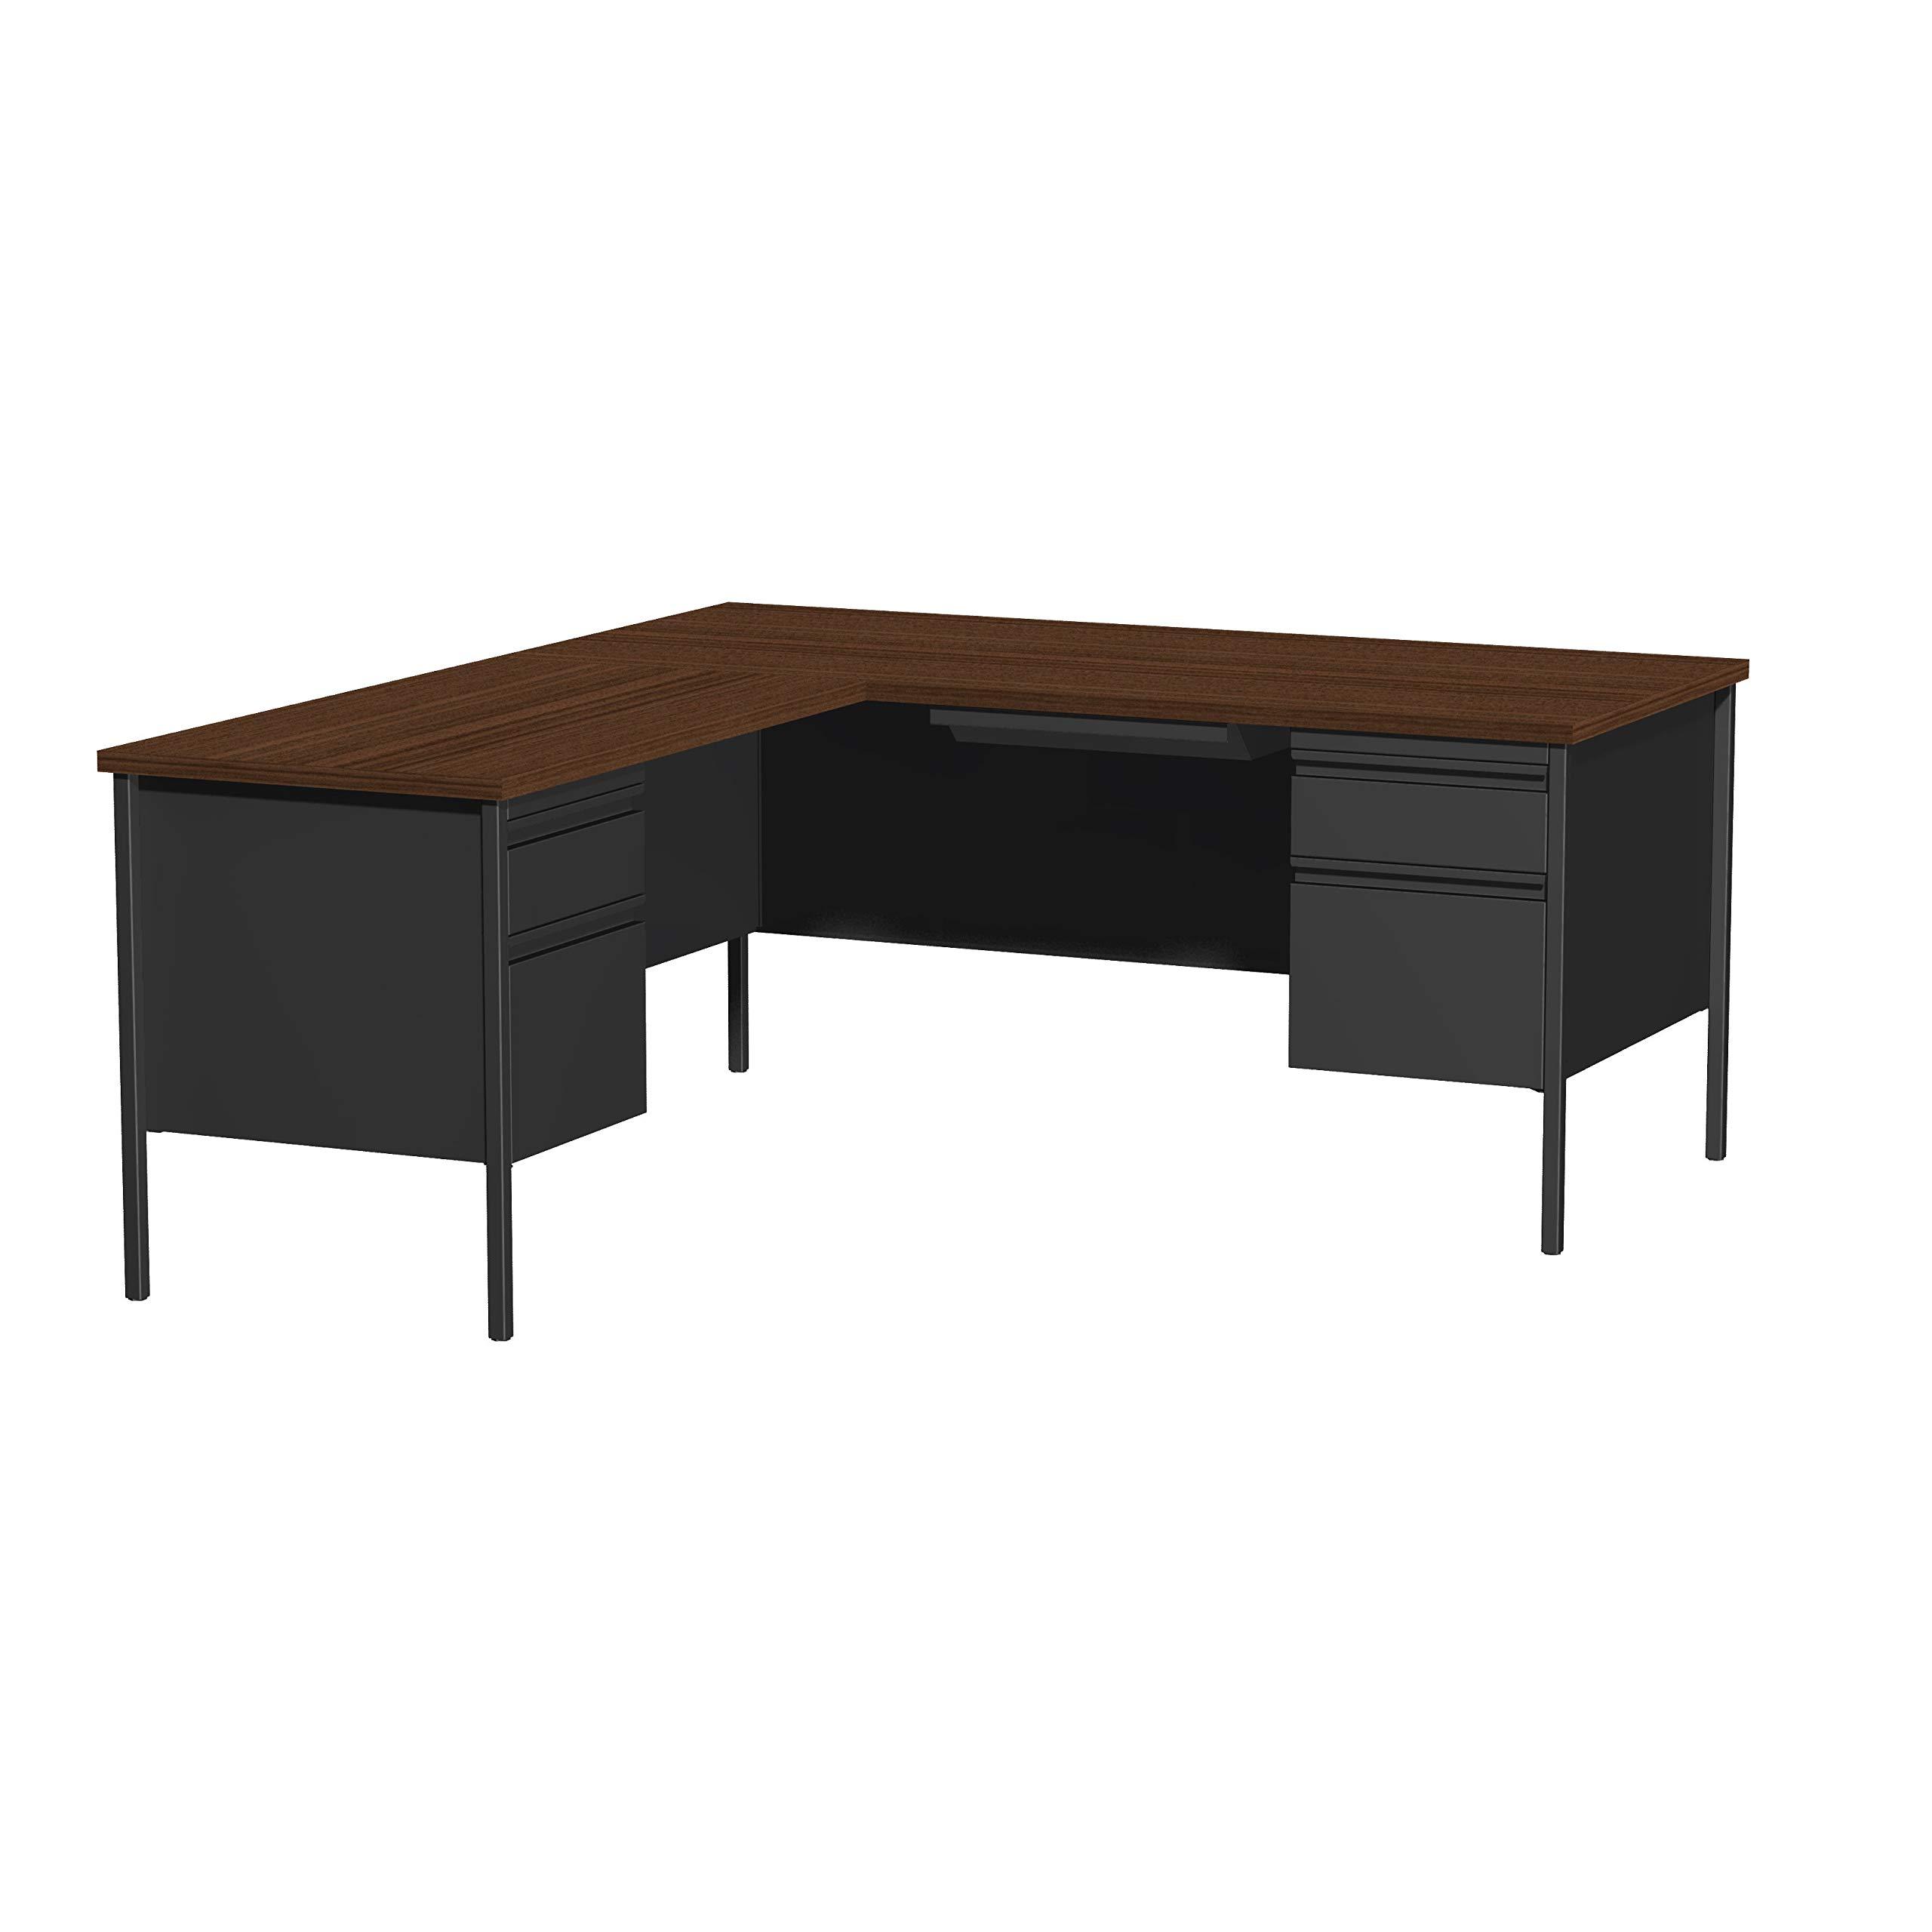 HL10000 Series Computer Desk Laptop Table L-Shape Left Orientation Double Pedestal Writing Desk Home Office Workstation Metal, Black and Walnut